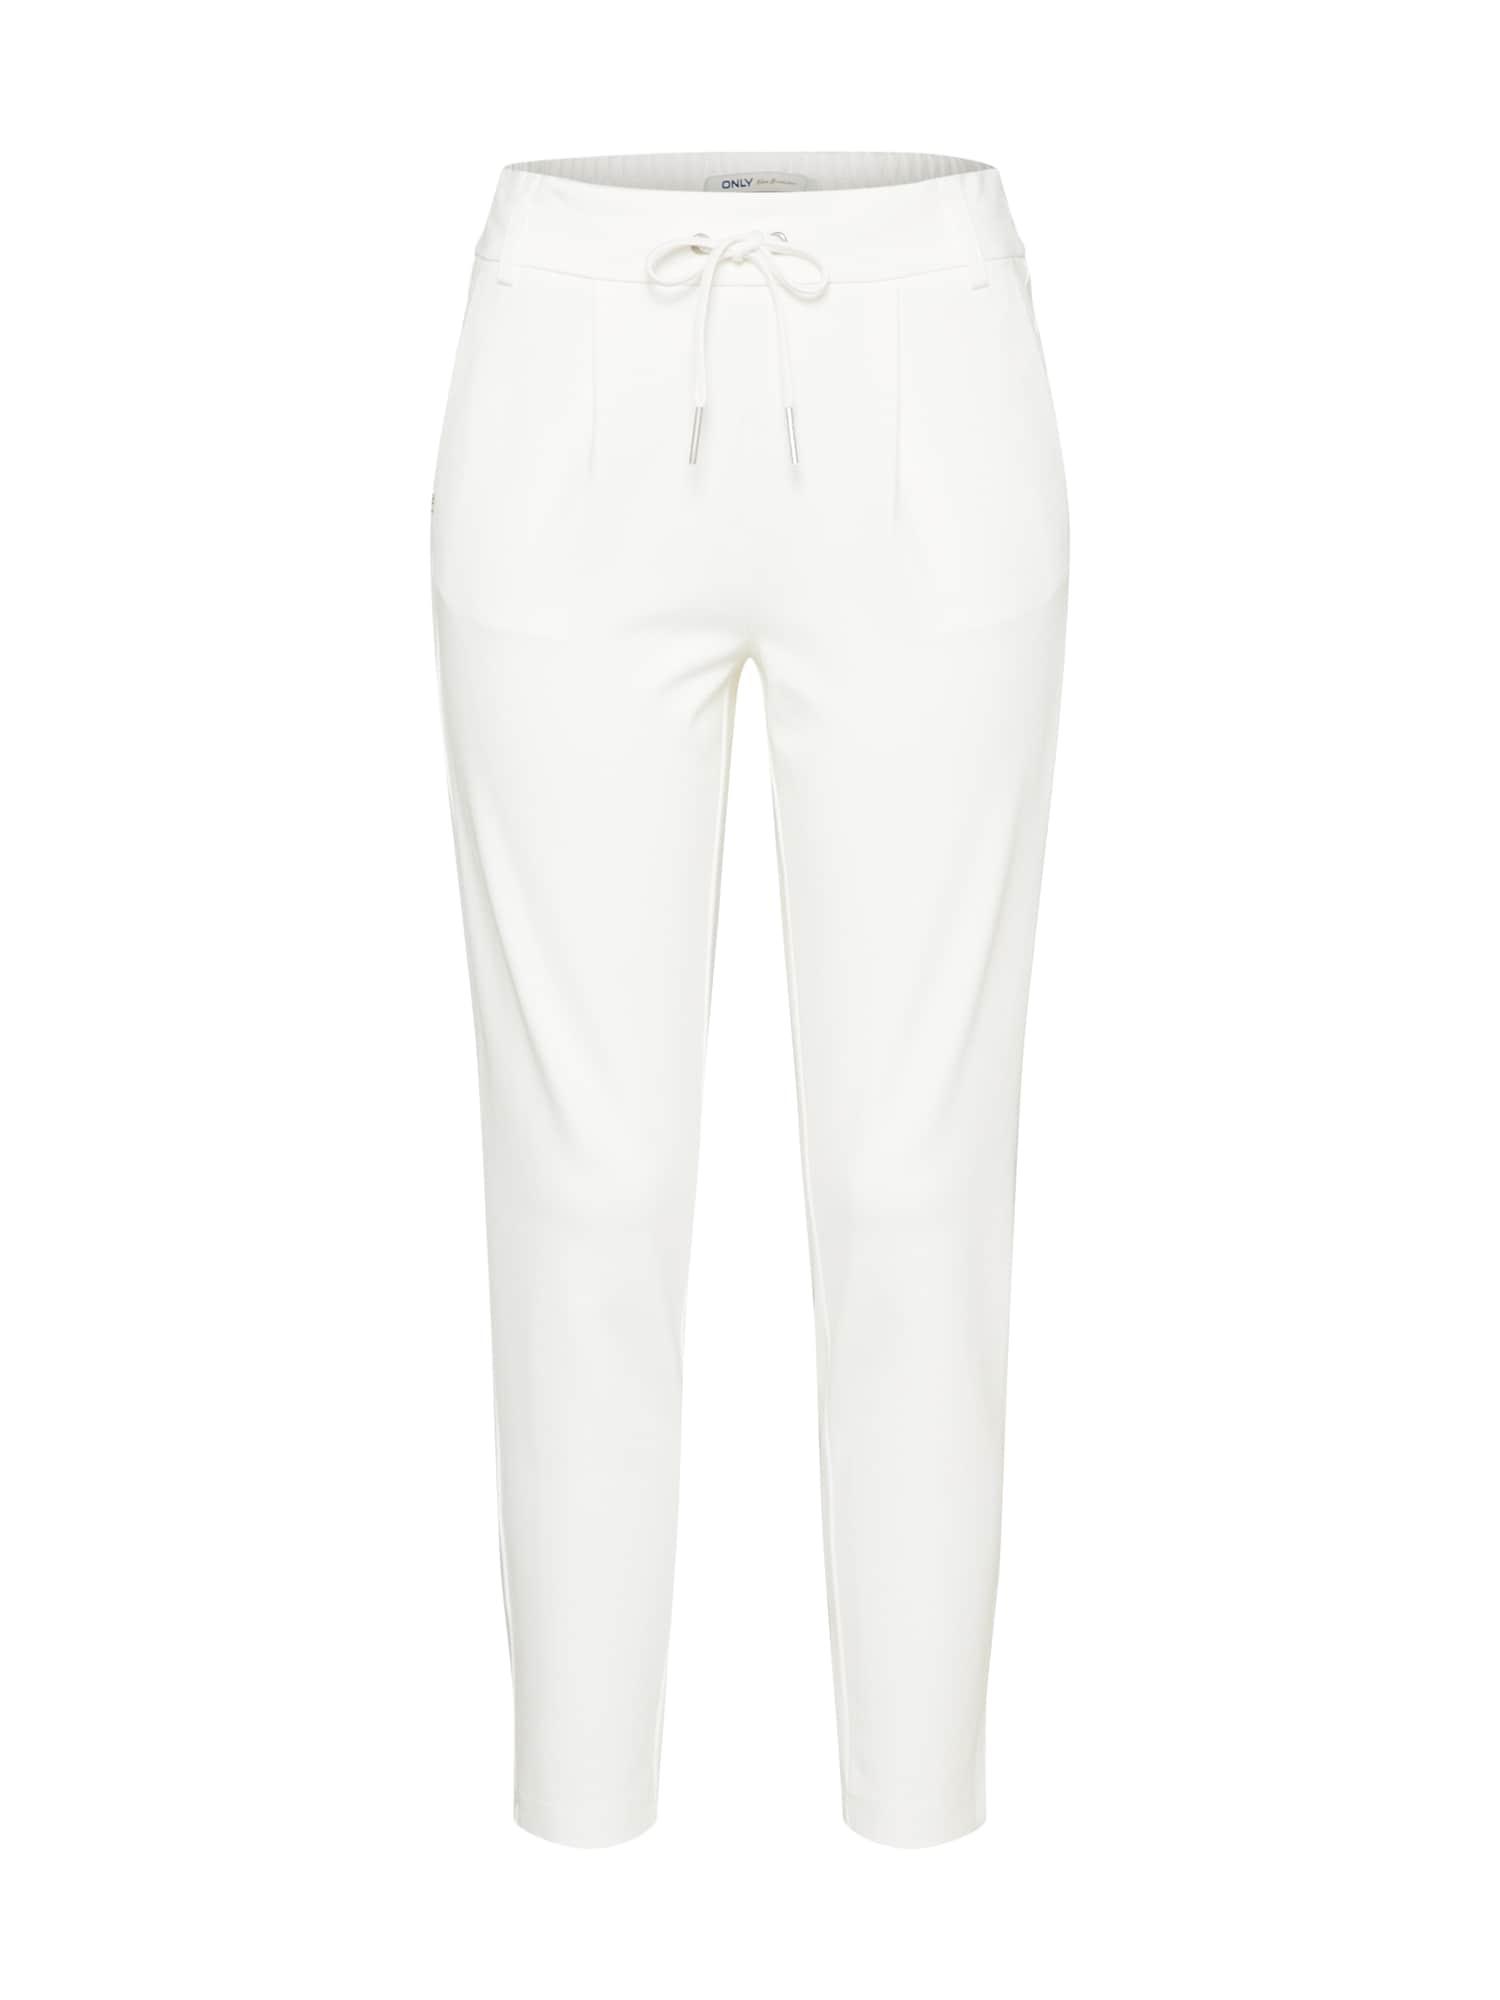 ONLY Pantalon à pince 'Poptrash'  - Blanc - Taille: L - female